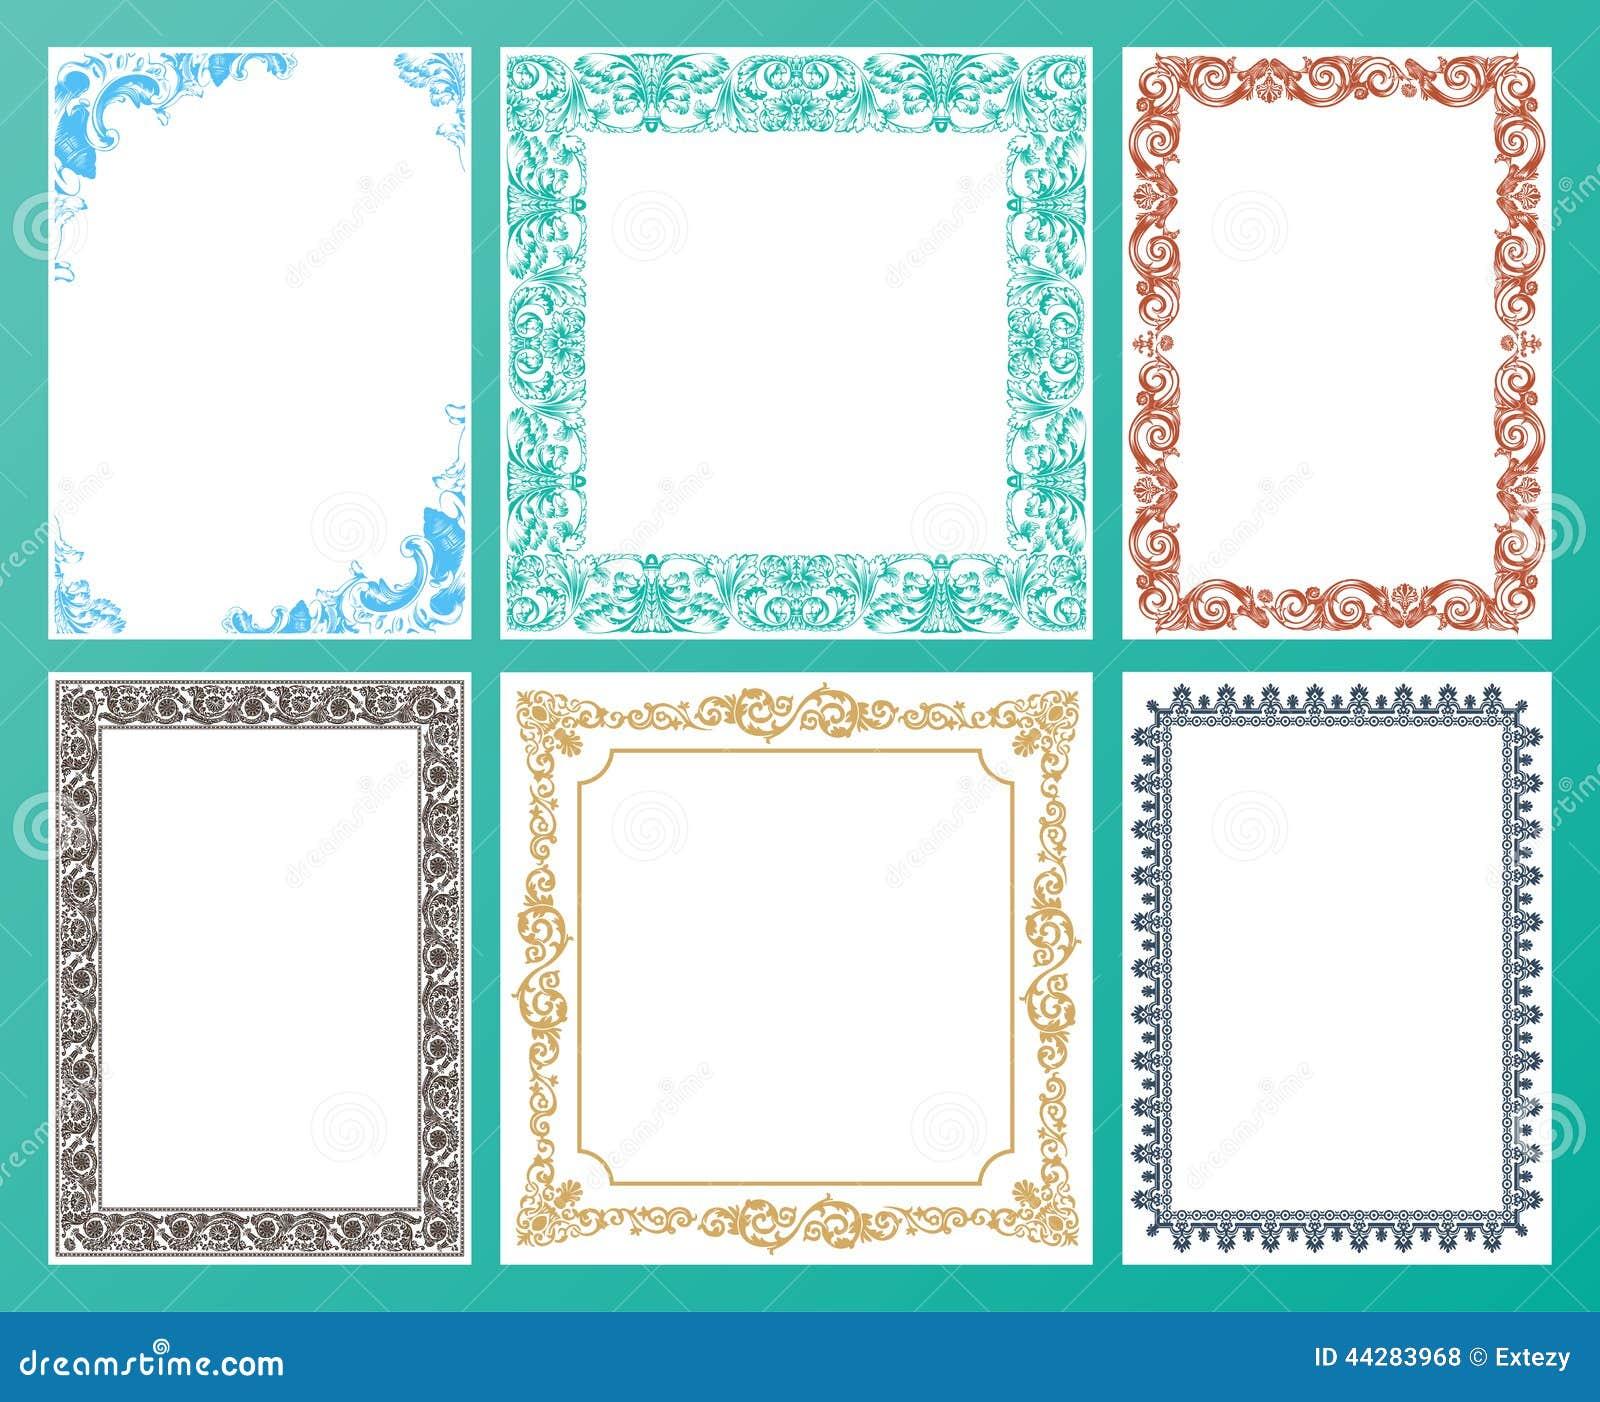 Vector Color Set. Ornate Frames And Vintage Scroll Elements Stock ...